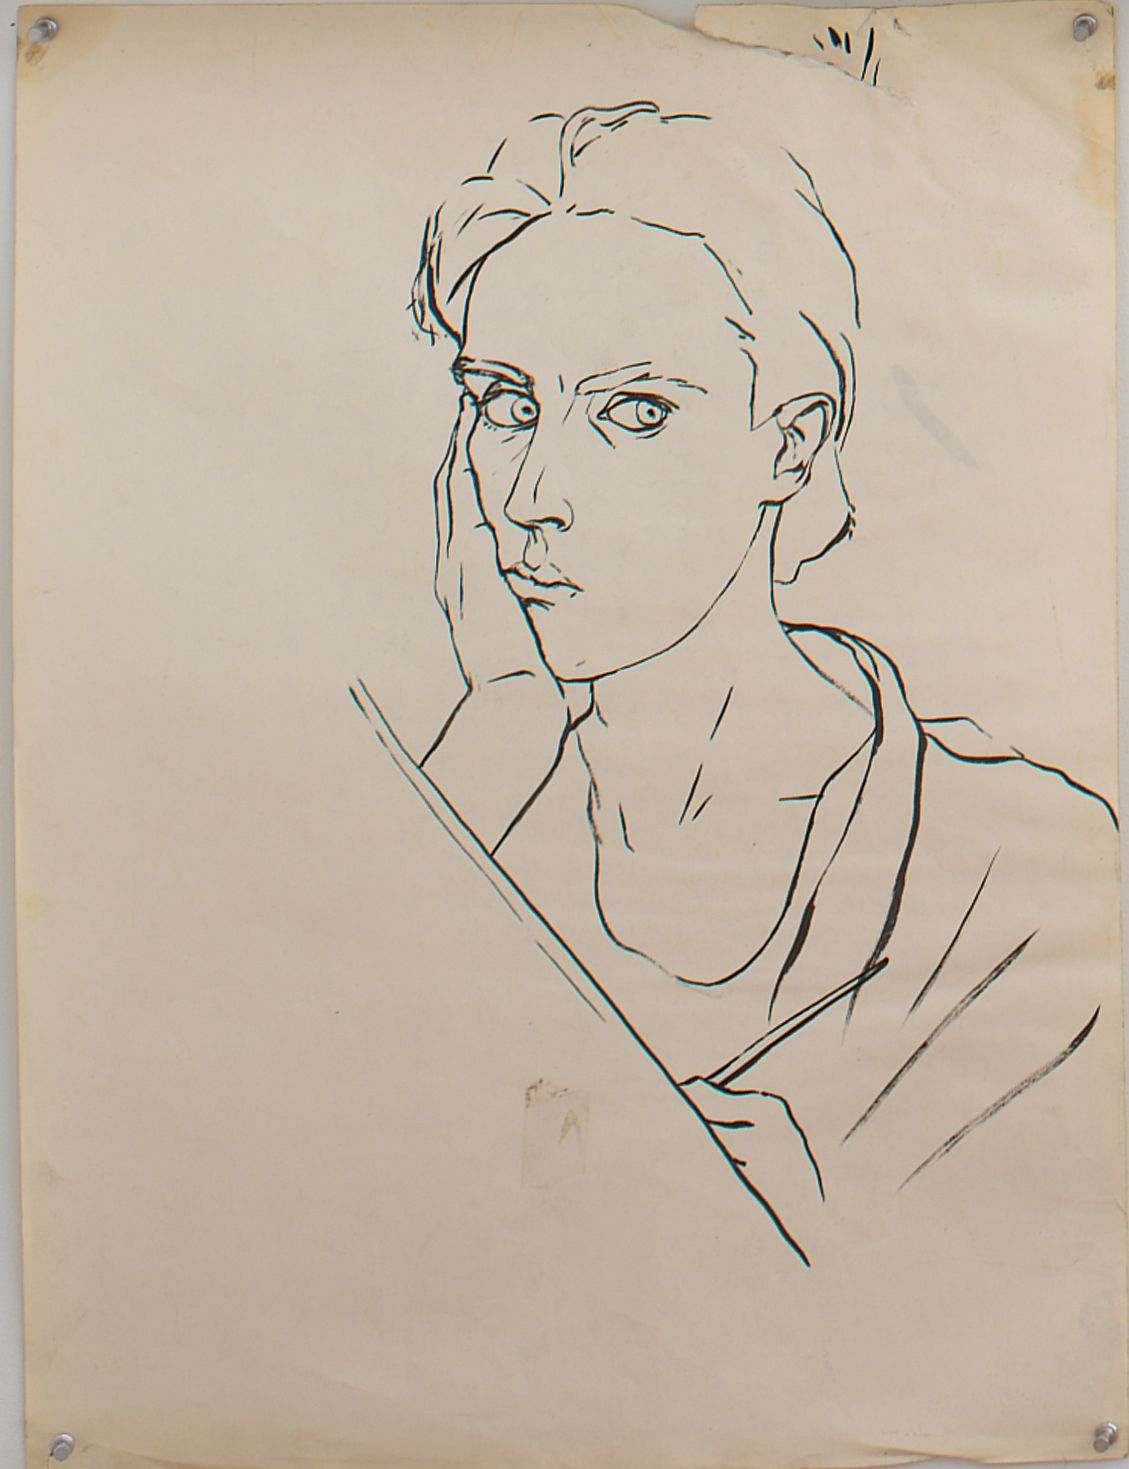 Untitled I, 1979, Ink on paper